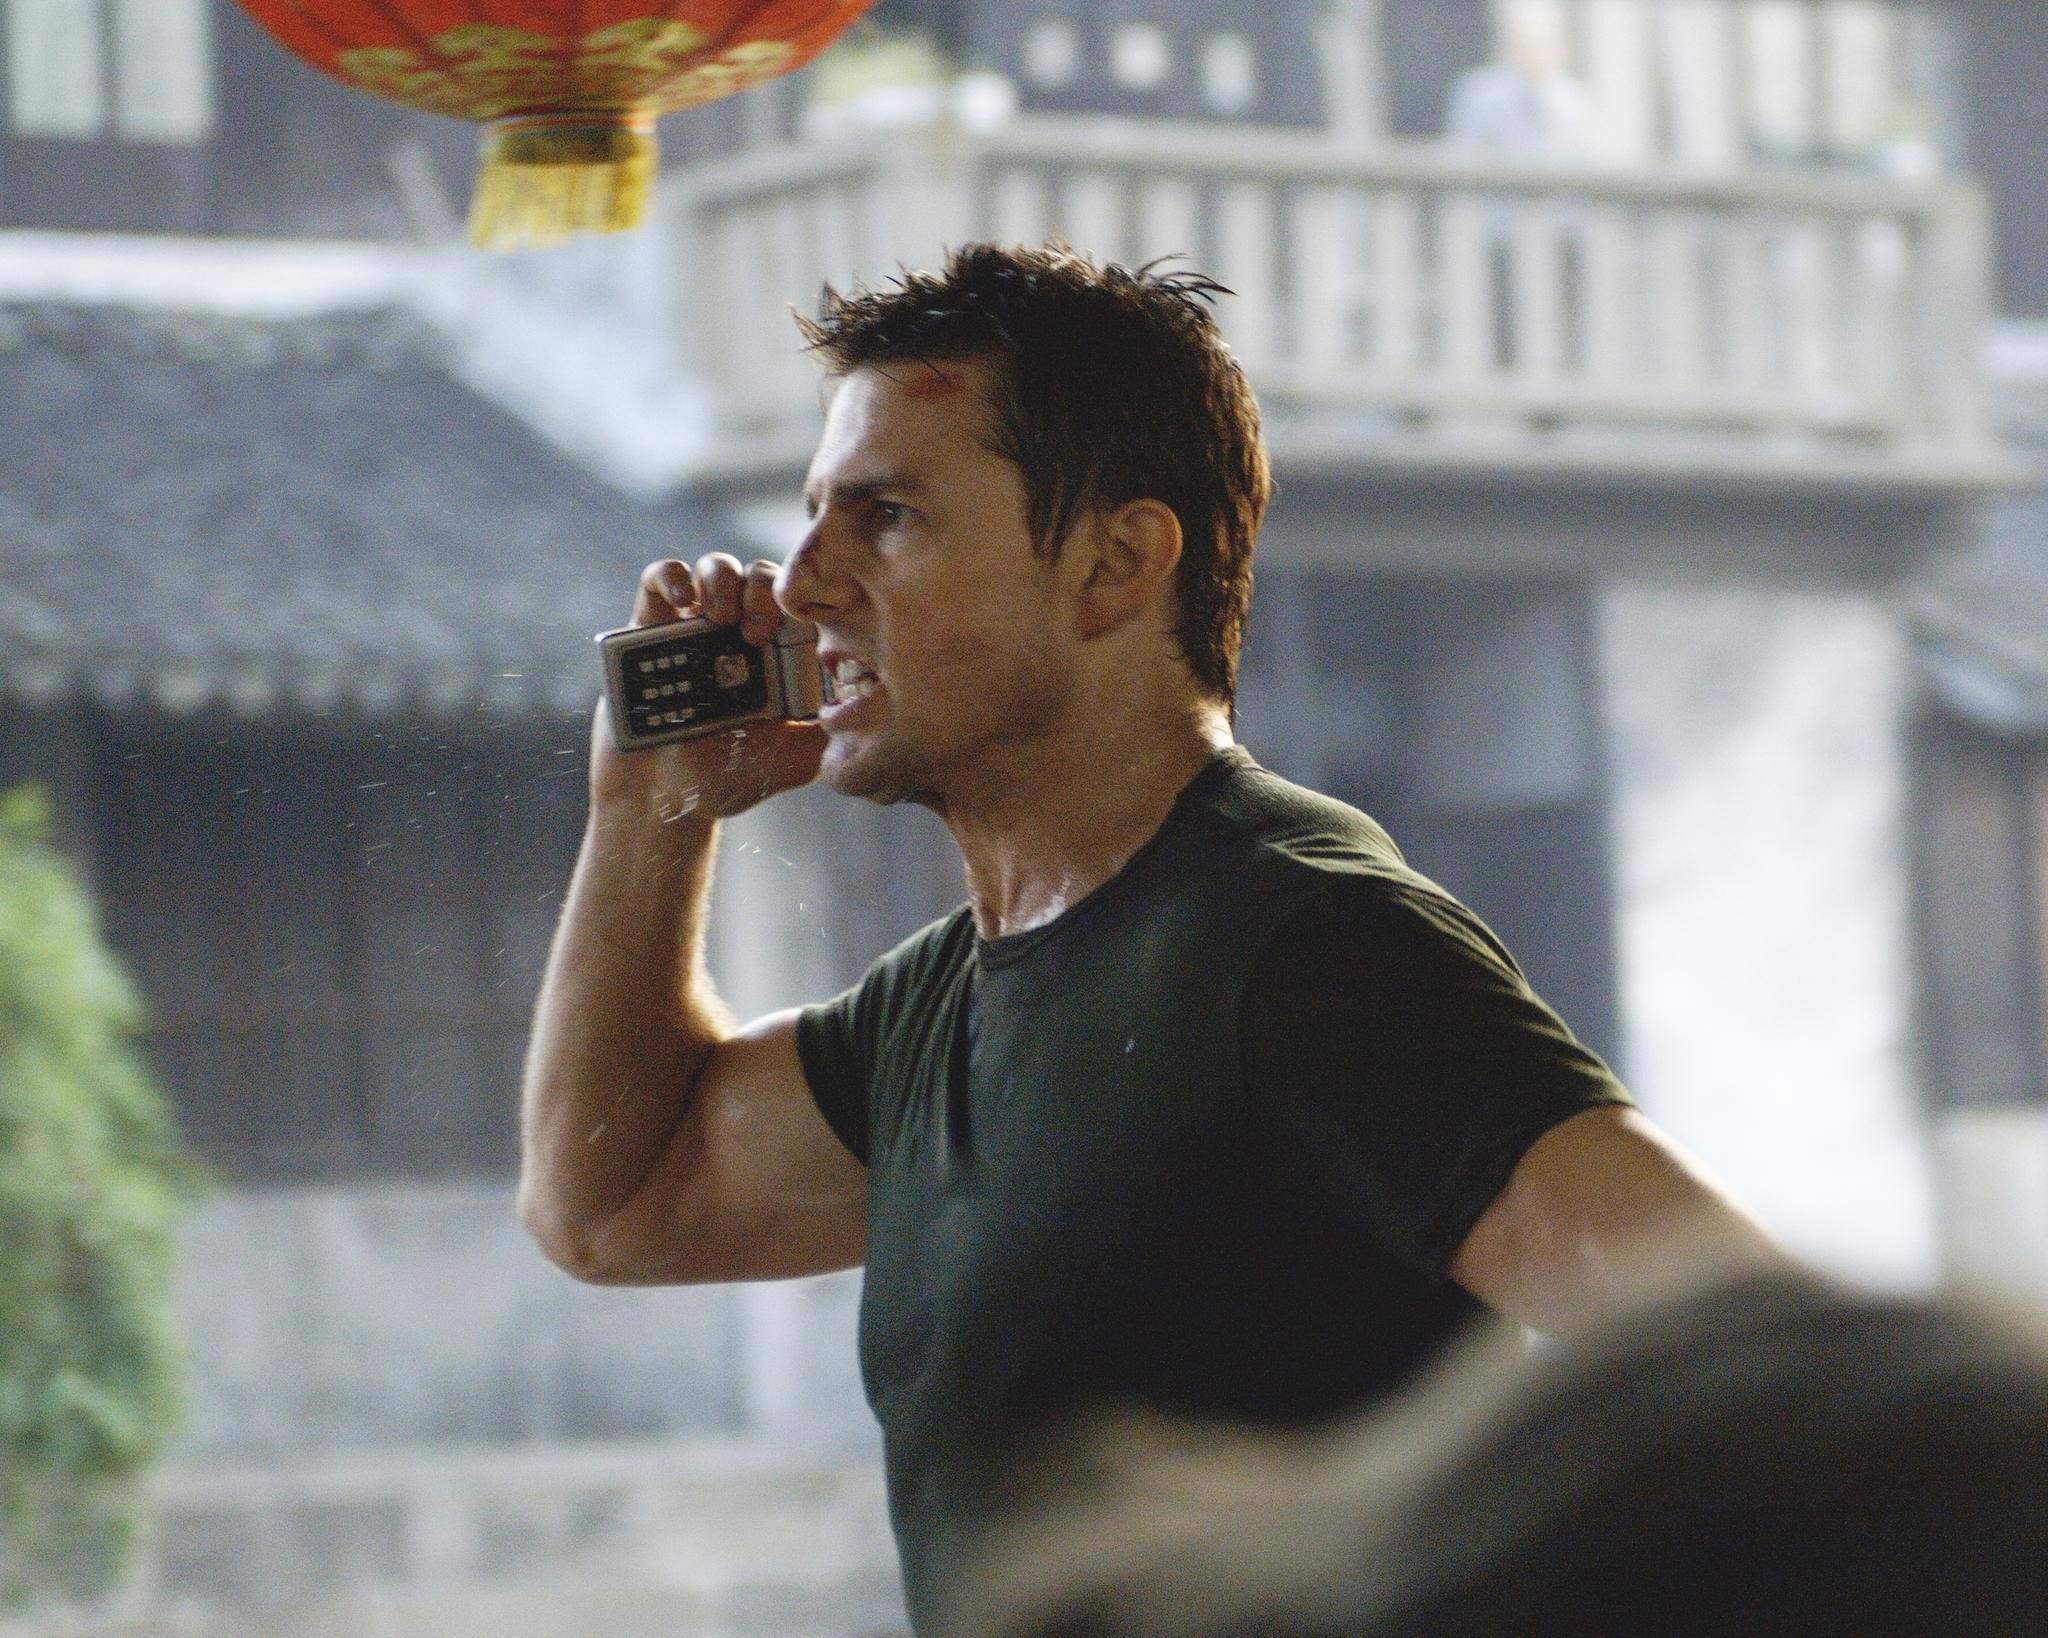 Миссия невыполнима 3 (Mission Impossible 3) 2000 год как менялсяТом Круз